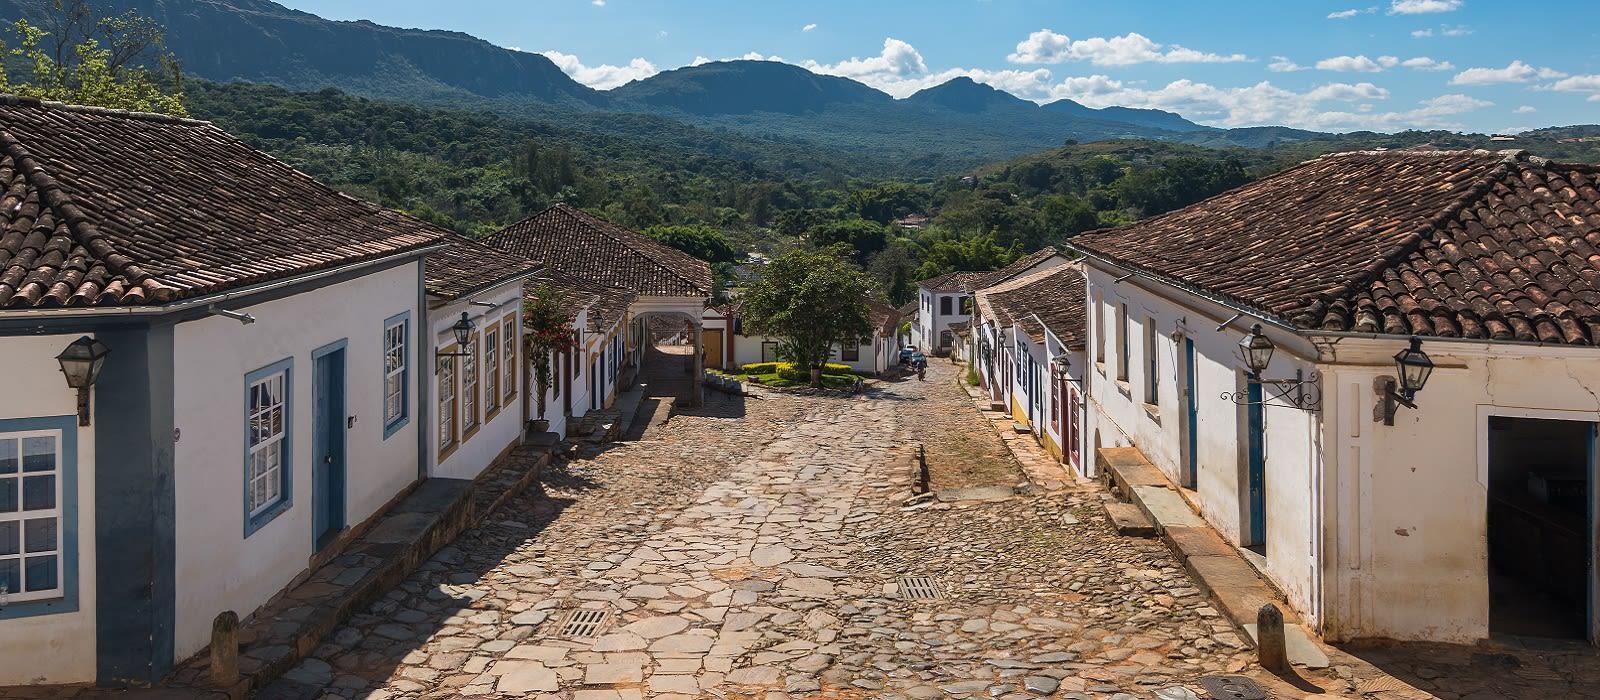 Brasilien: Koloniales Flair & unberührte Inseln Urlaub 3